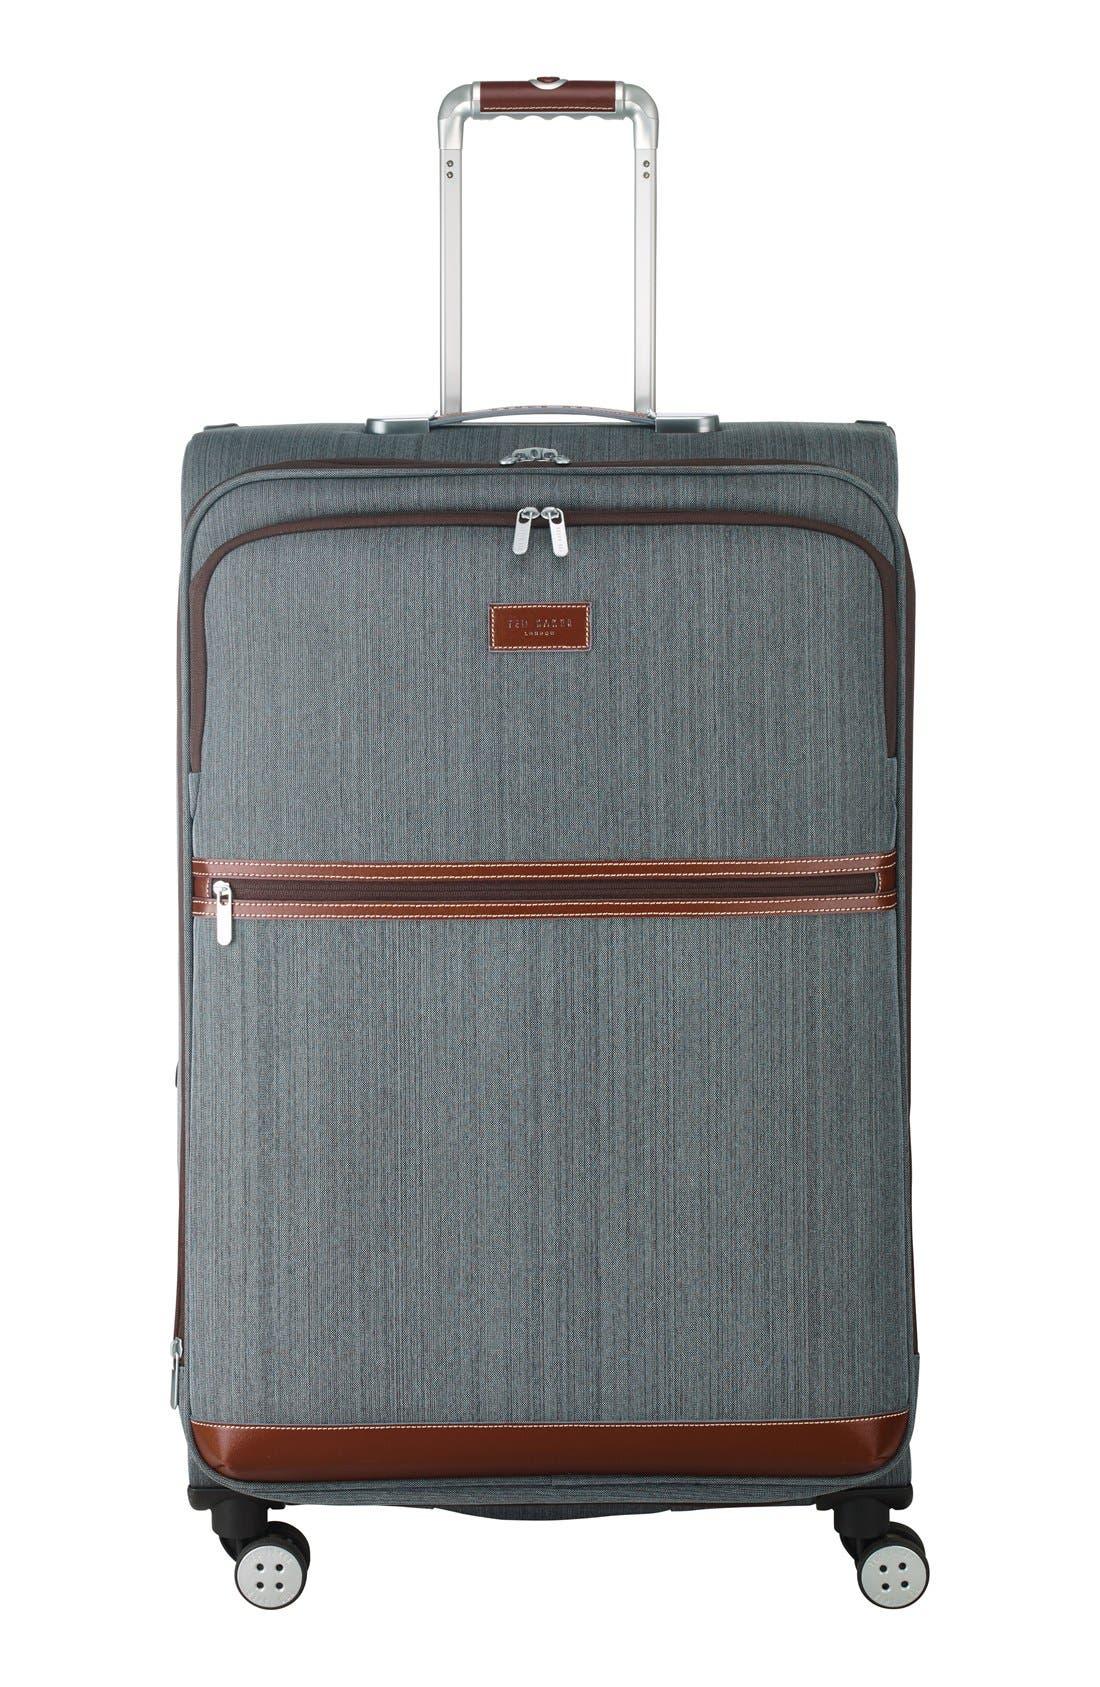 Ted Baker London 'Large Falconwood Grey' Four Wheel Suitcase (31 Inch)